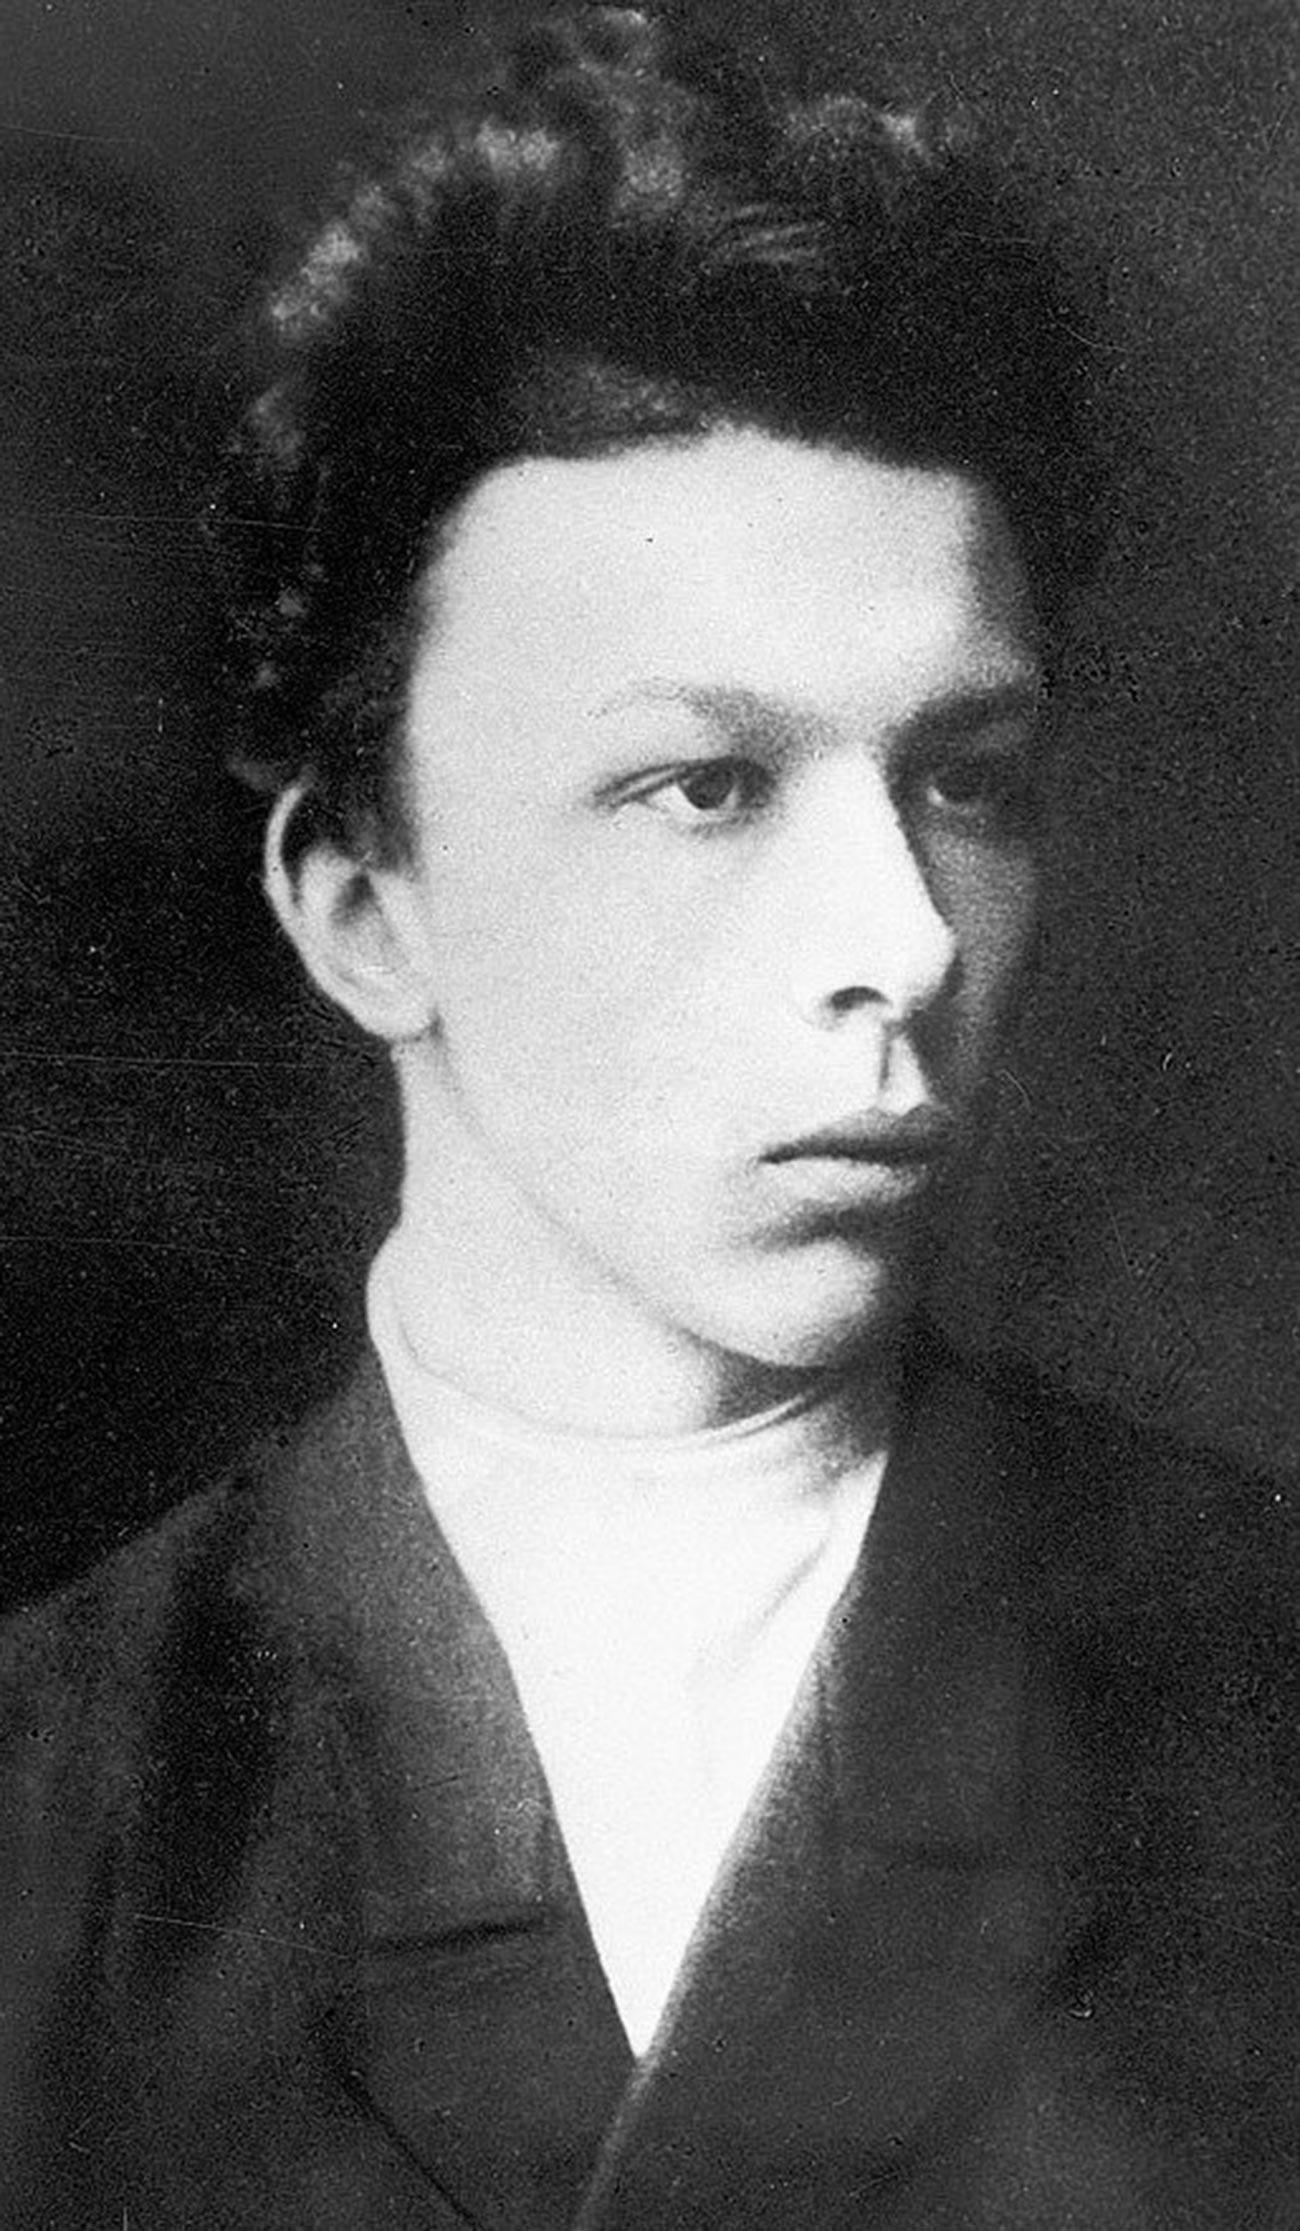 Aleksandr Ulyanov (1866—1887), abang Vladimr Lenin.